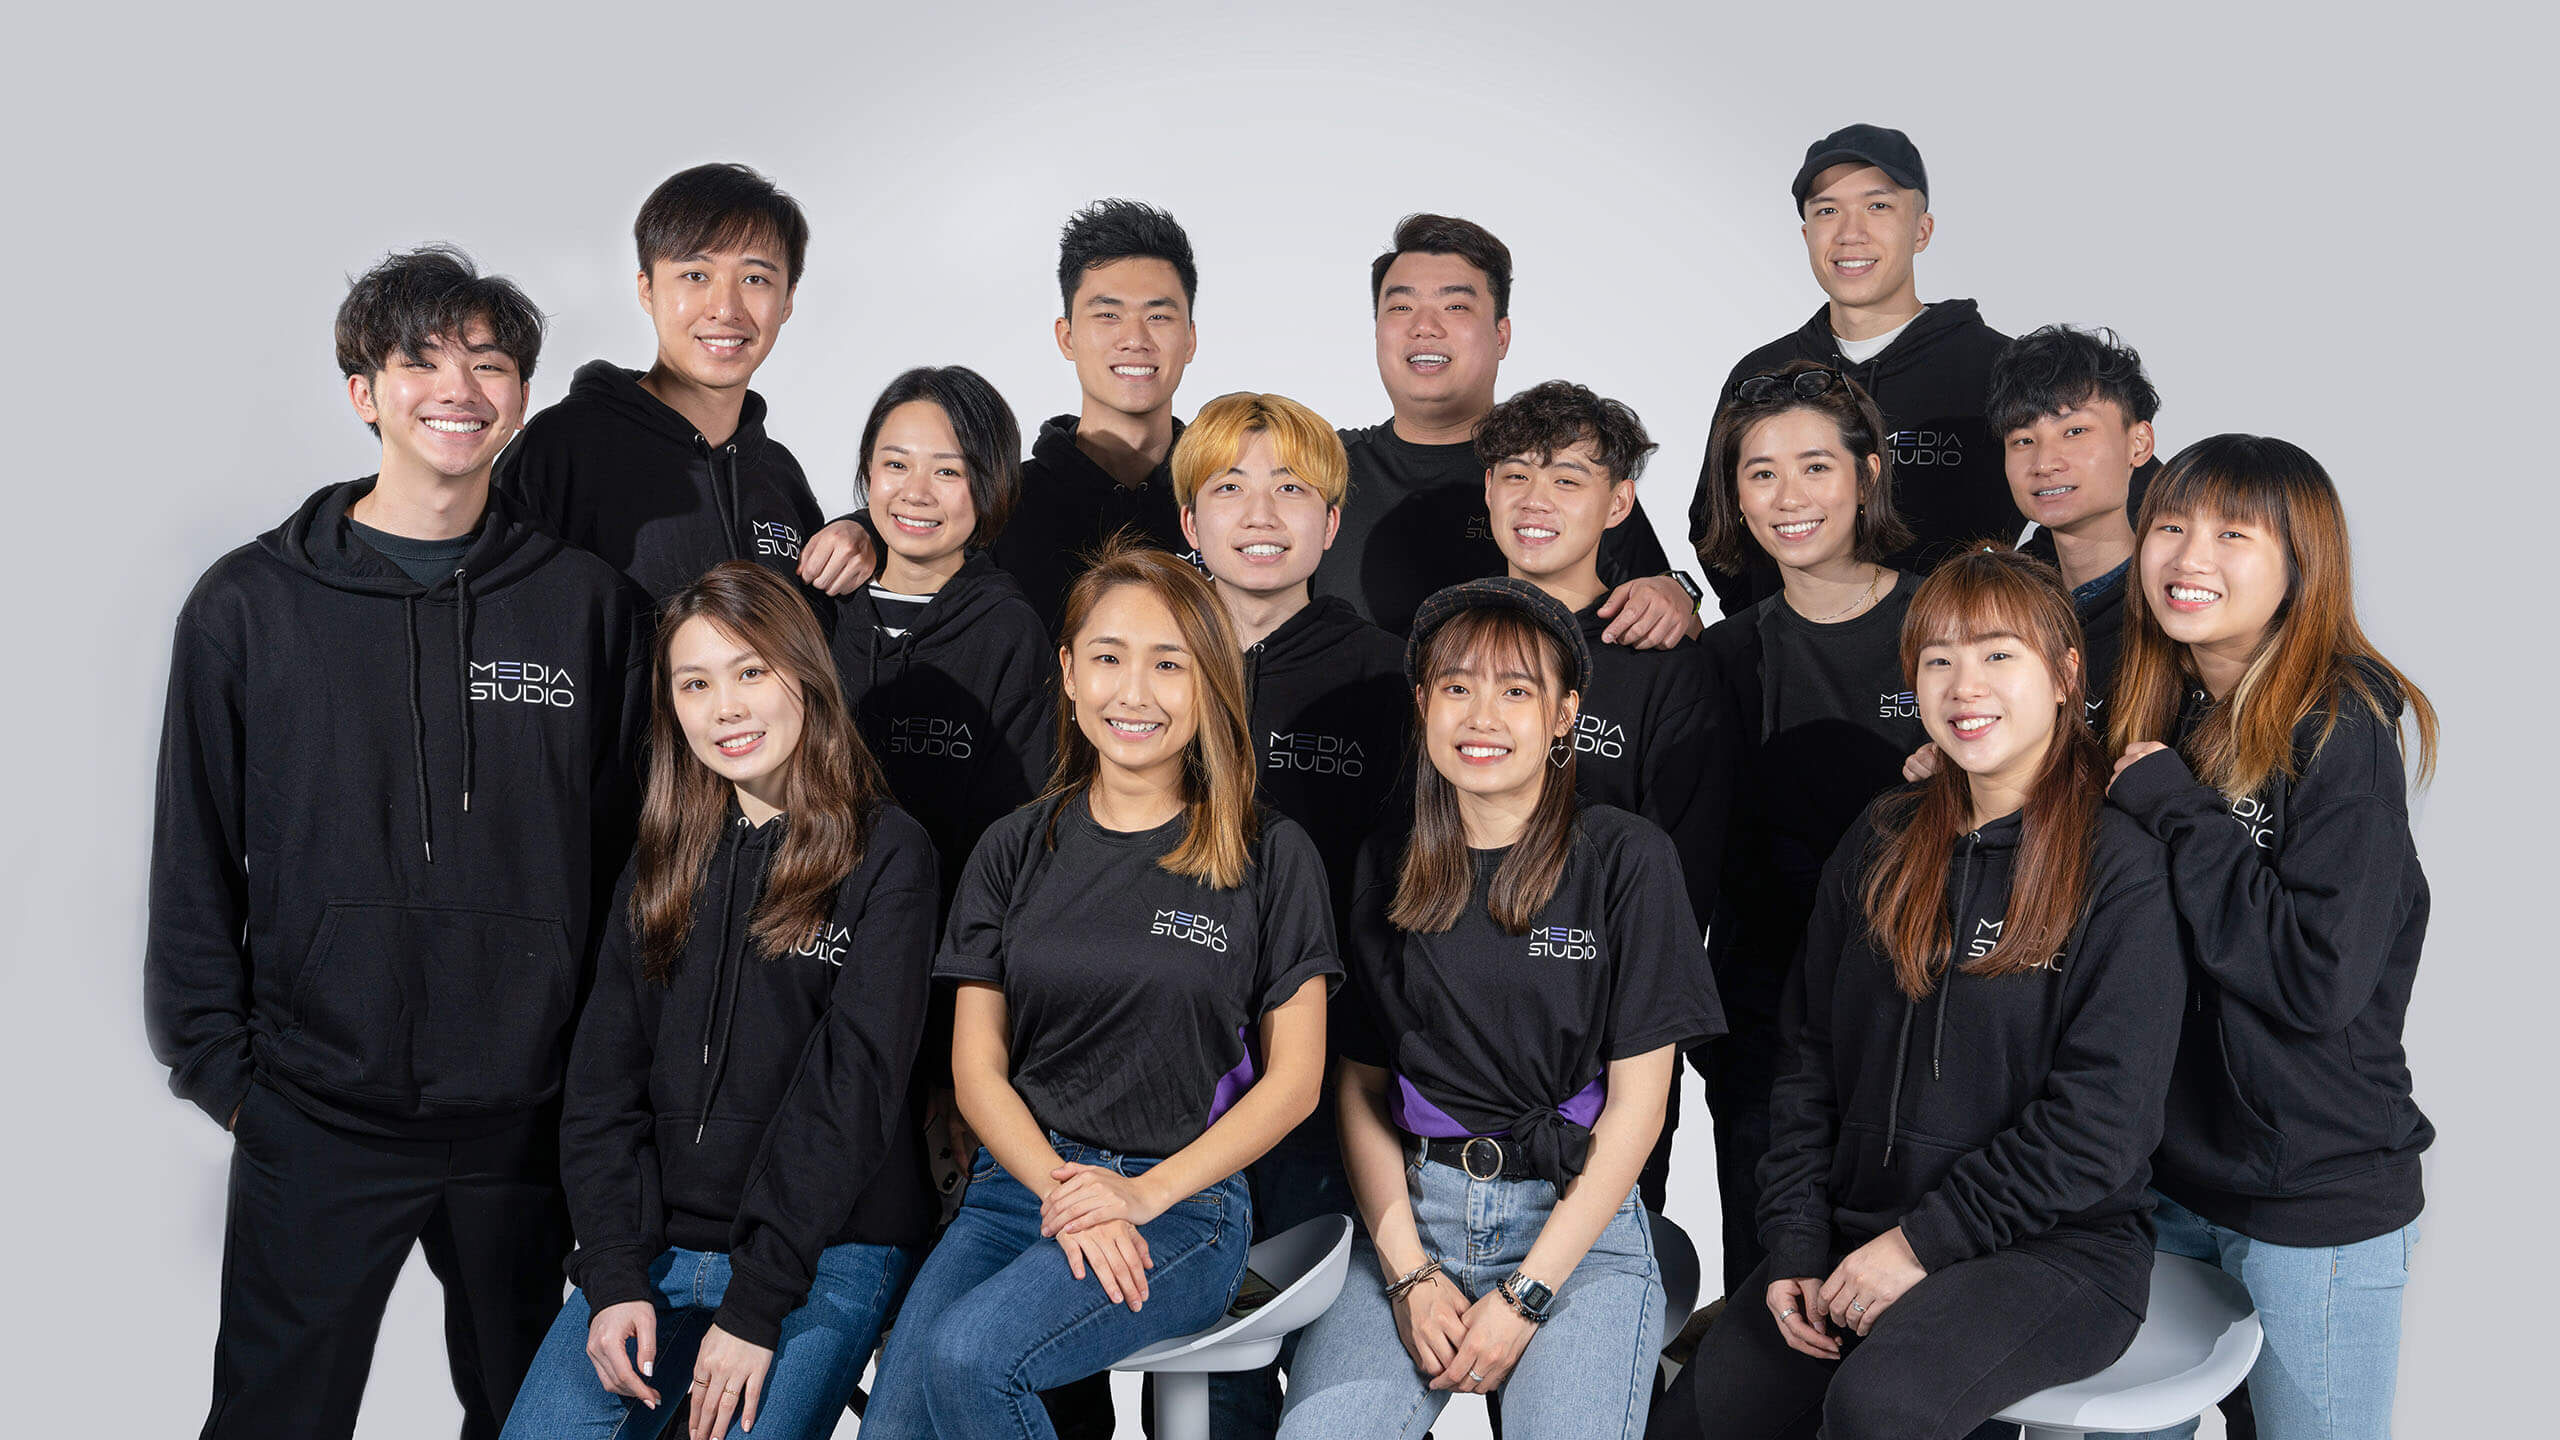 media studio hong kong team photo